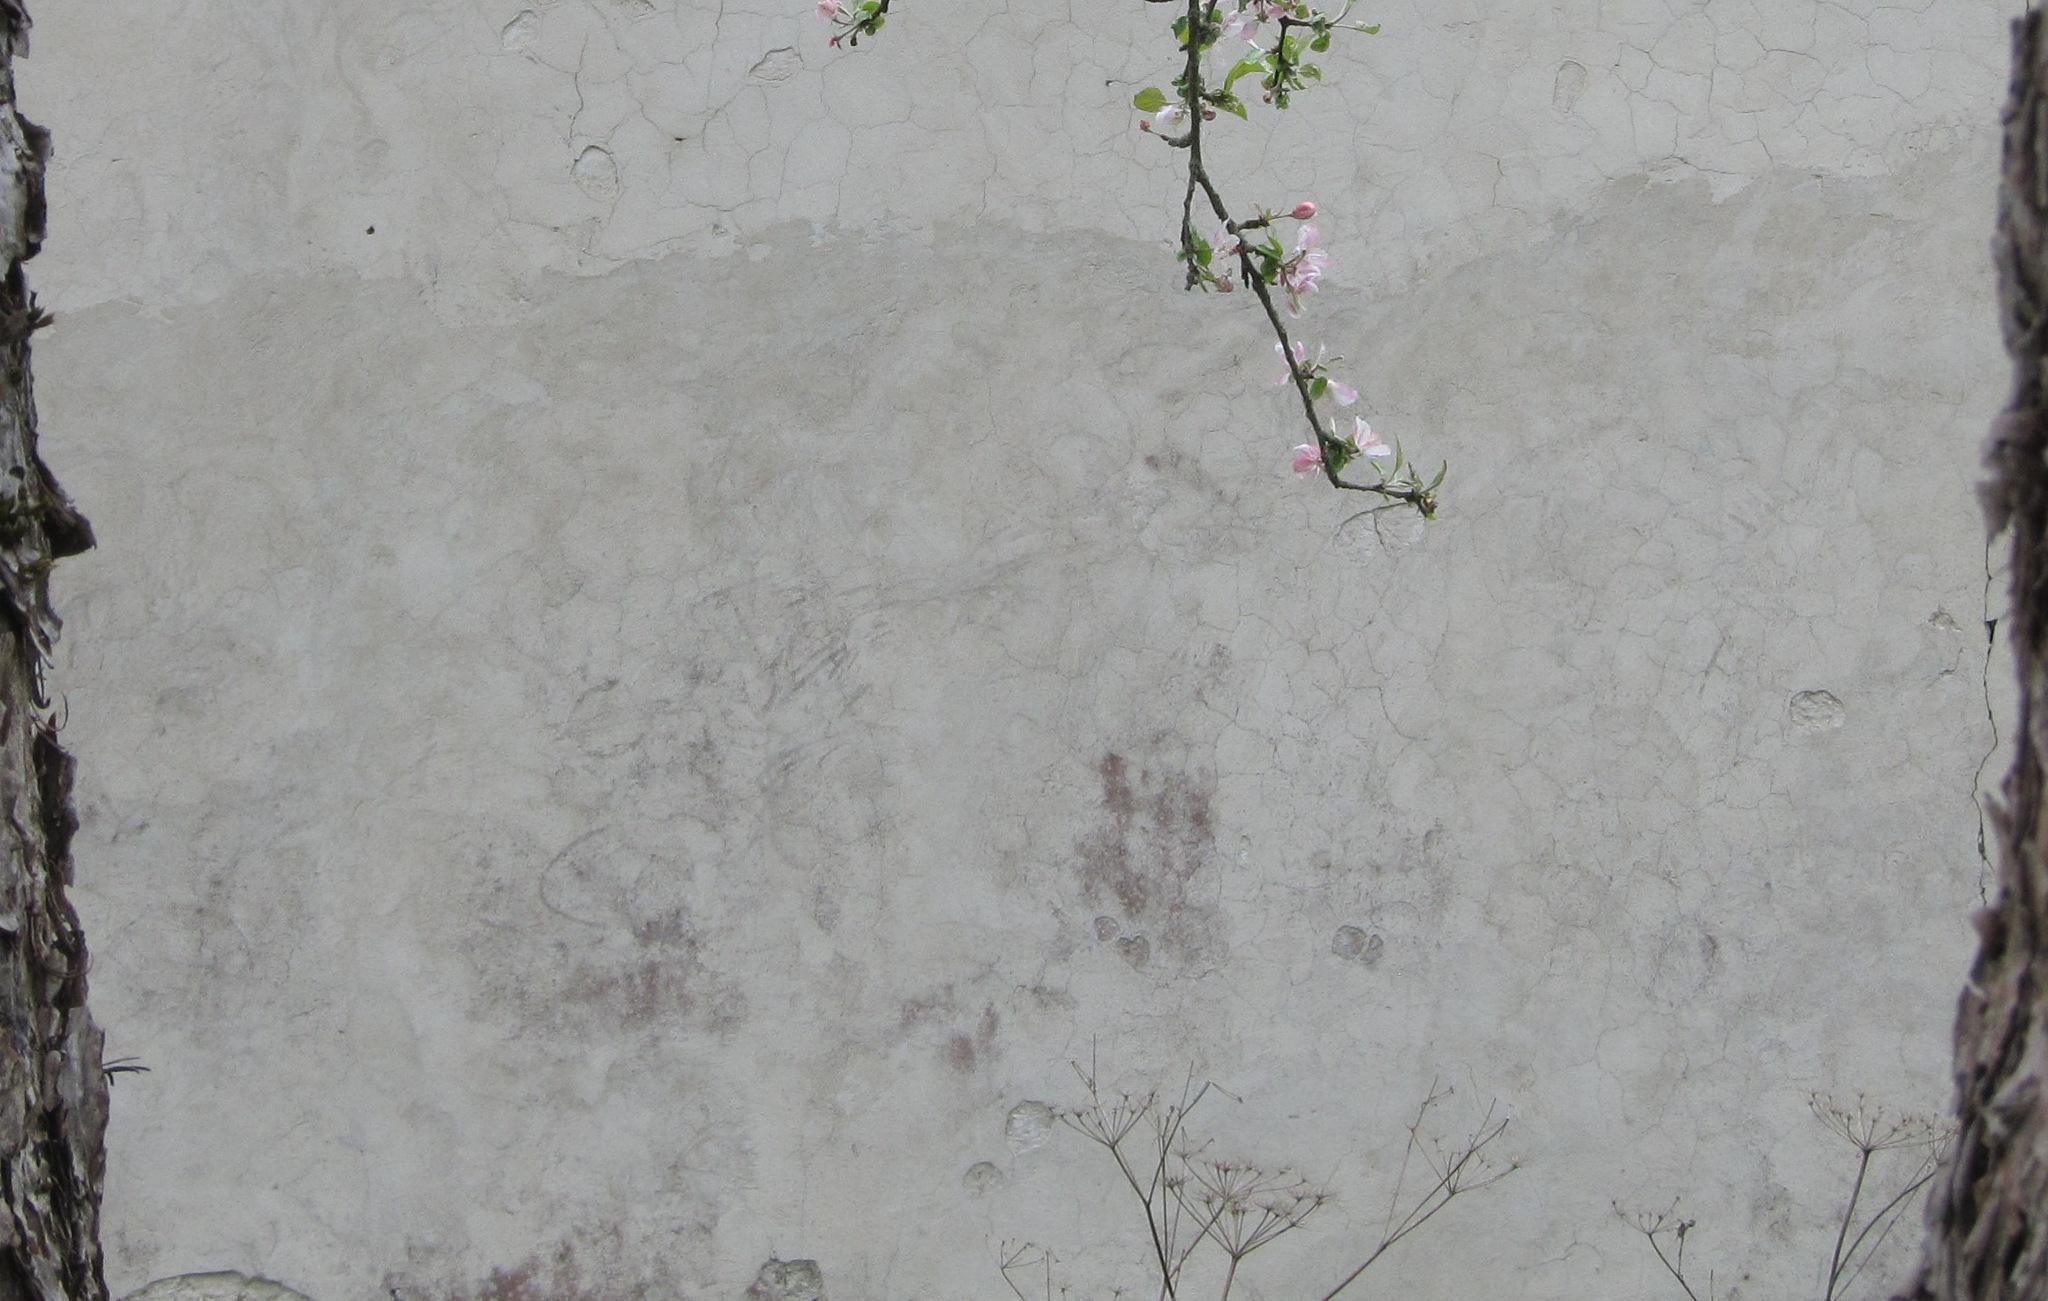 at apple-blossom-o'clock by anulumesadu